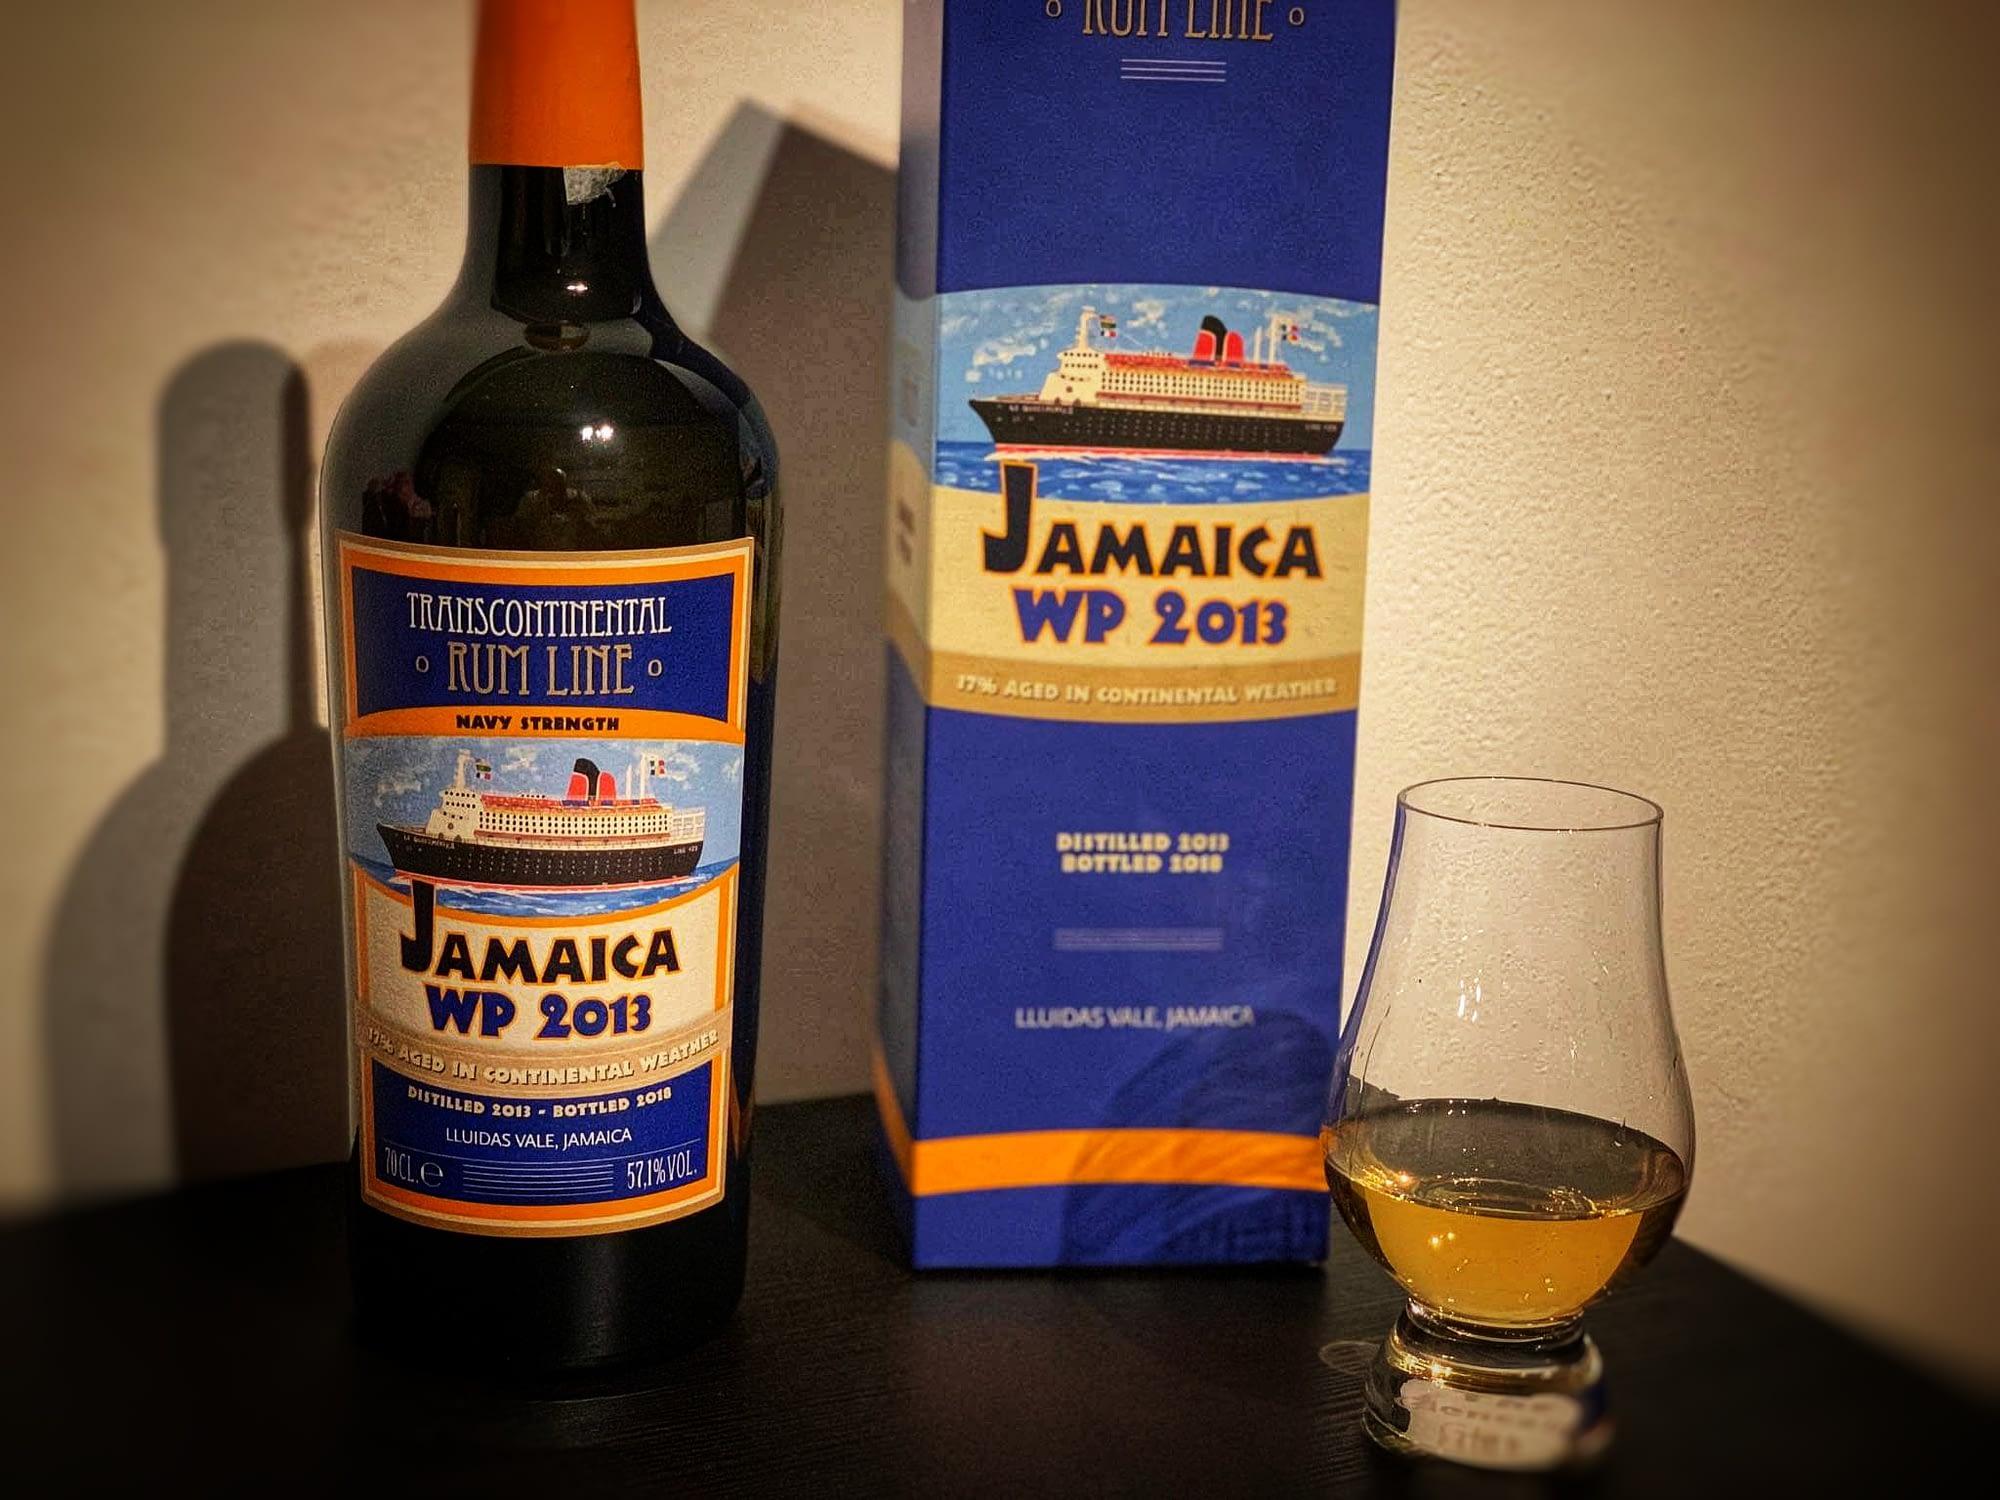 Transcontinental rum line WP 2013